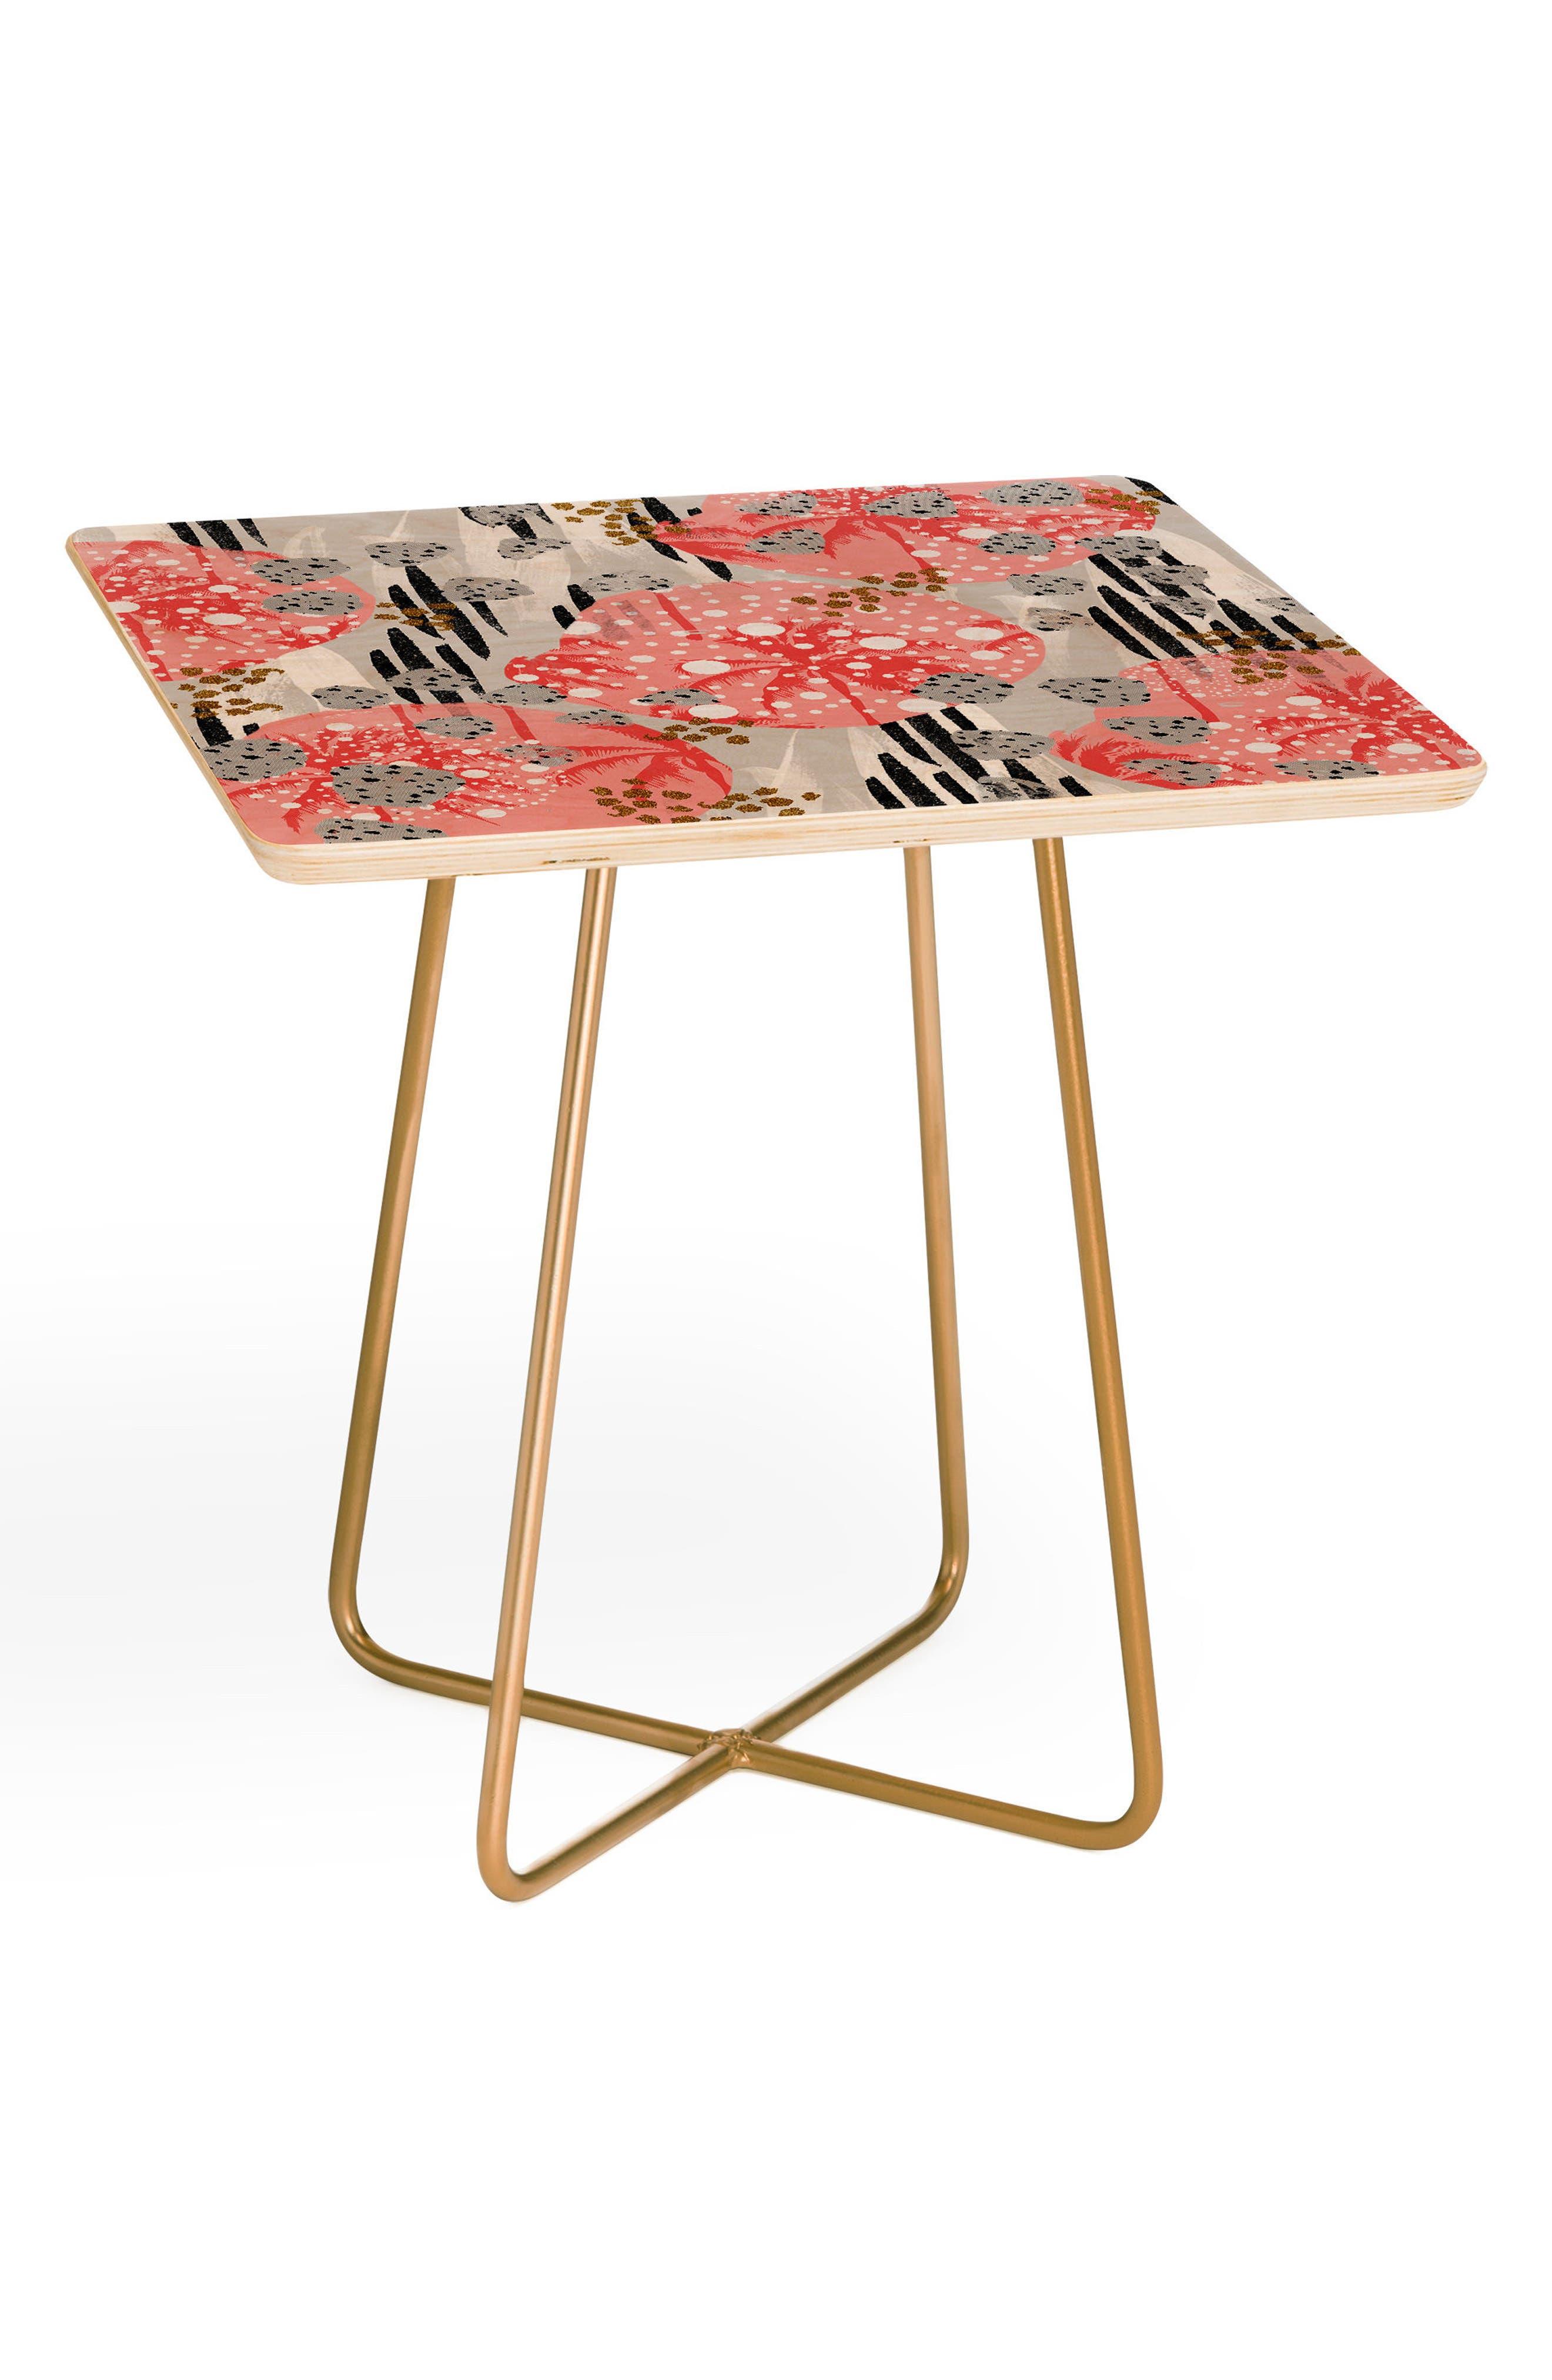 Marta B. Camarasa Abstract Side Table, Main, color, PINK